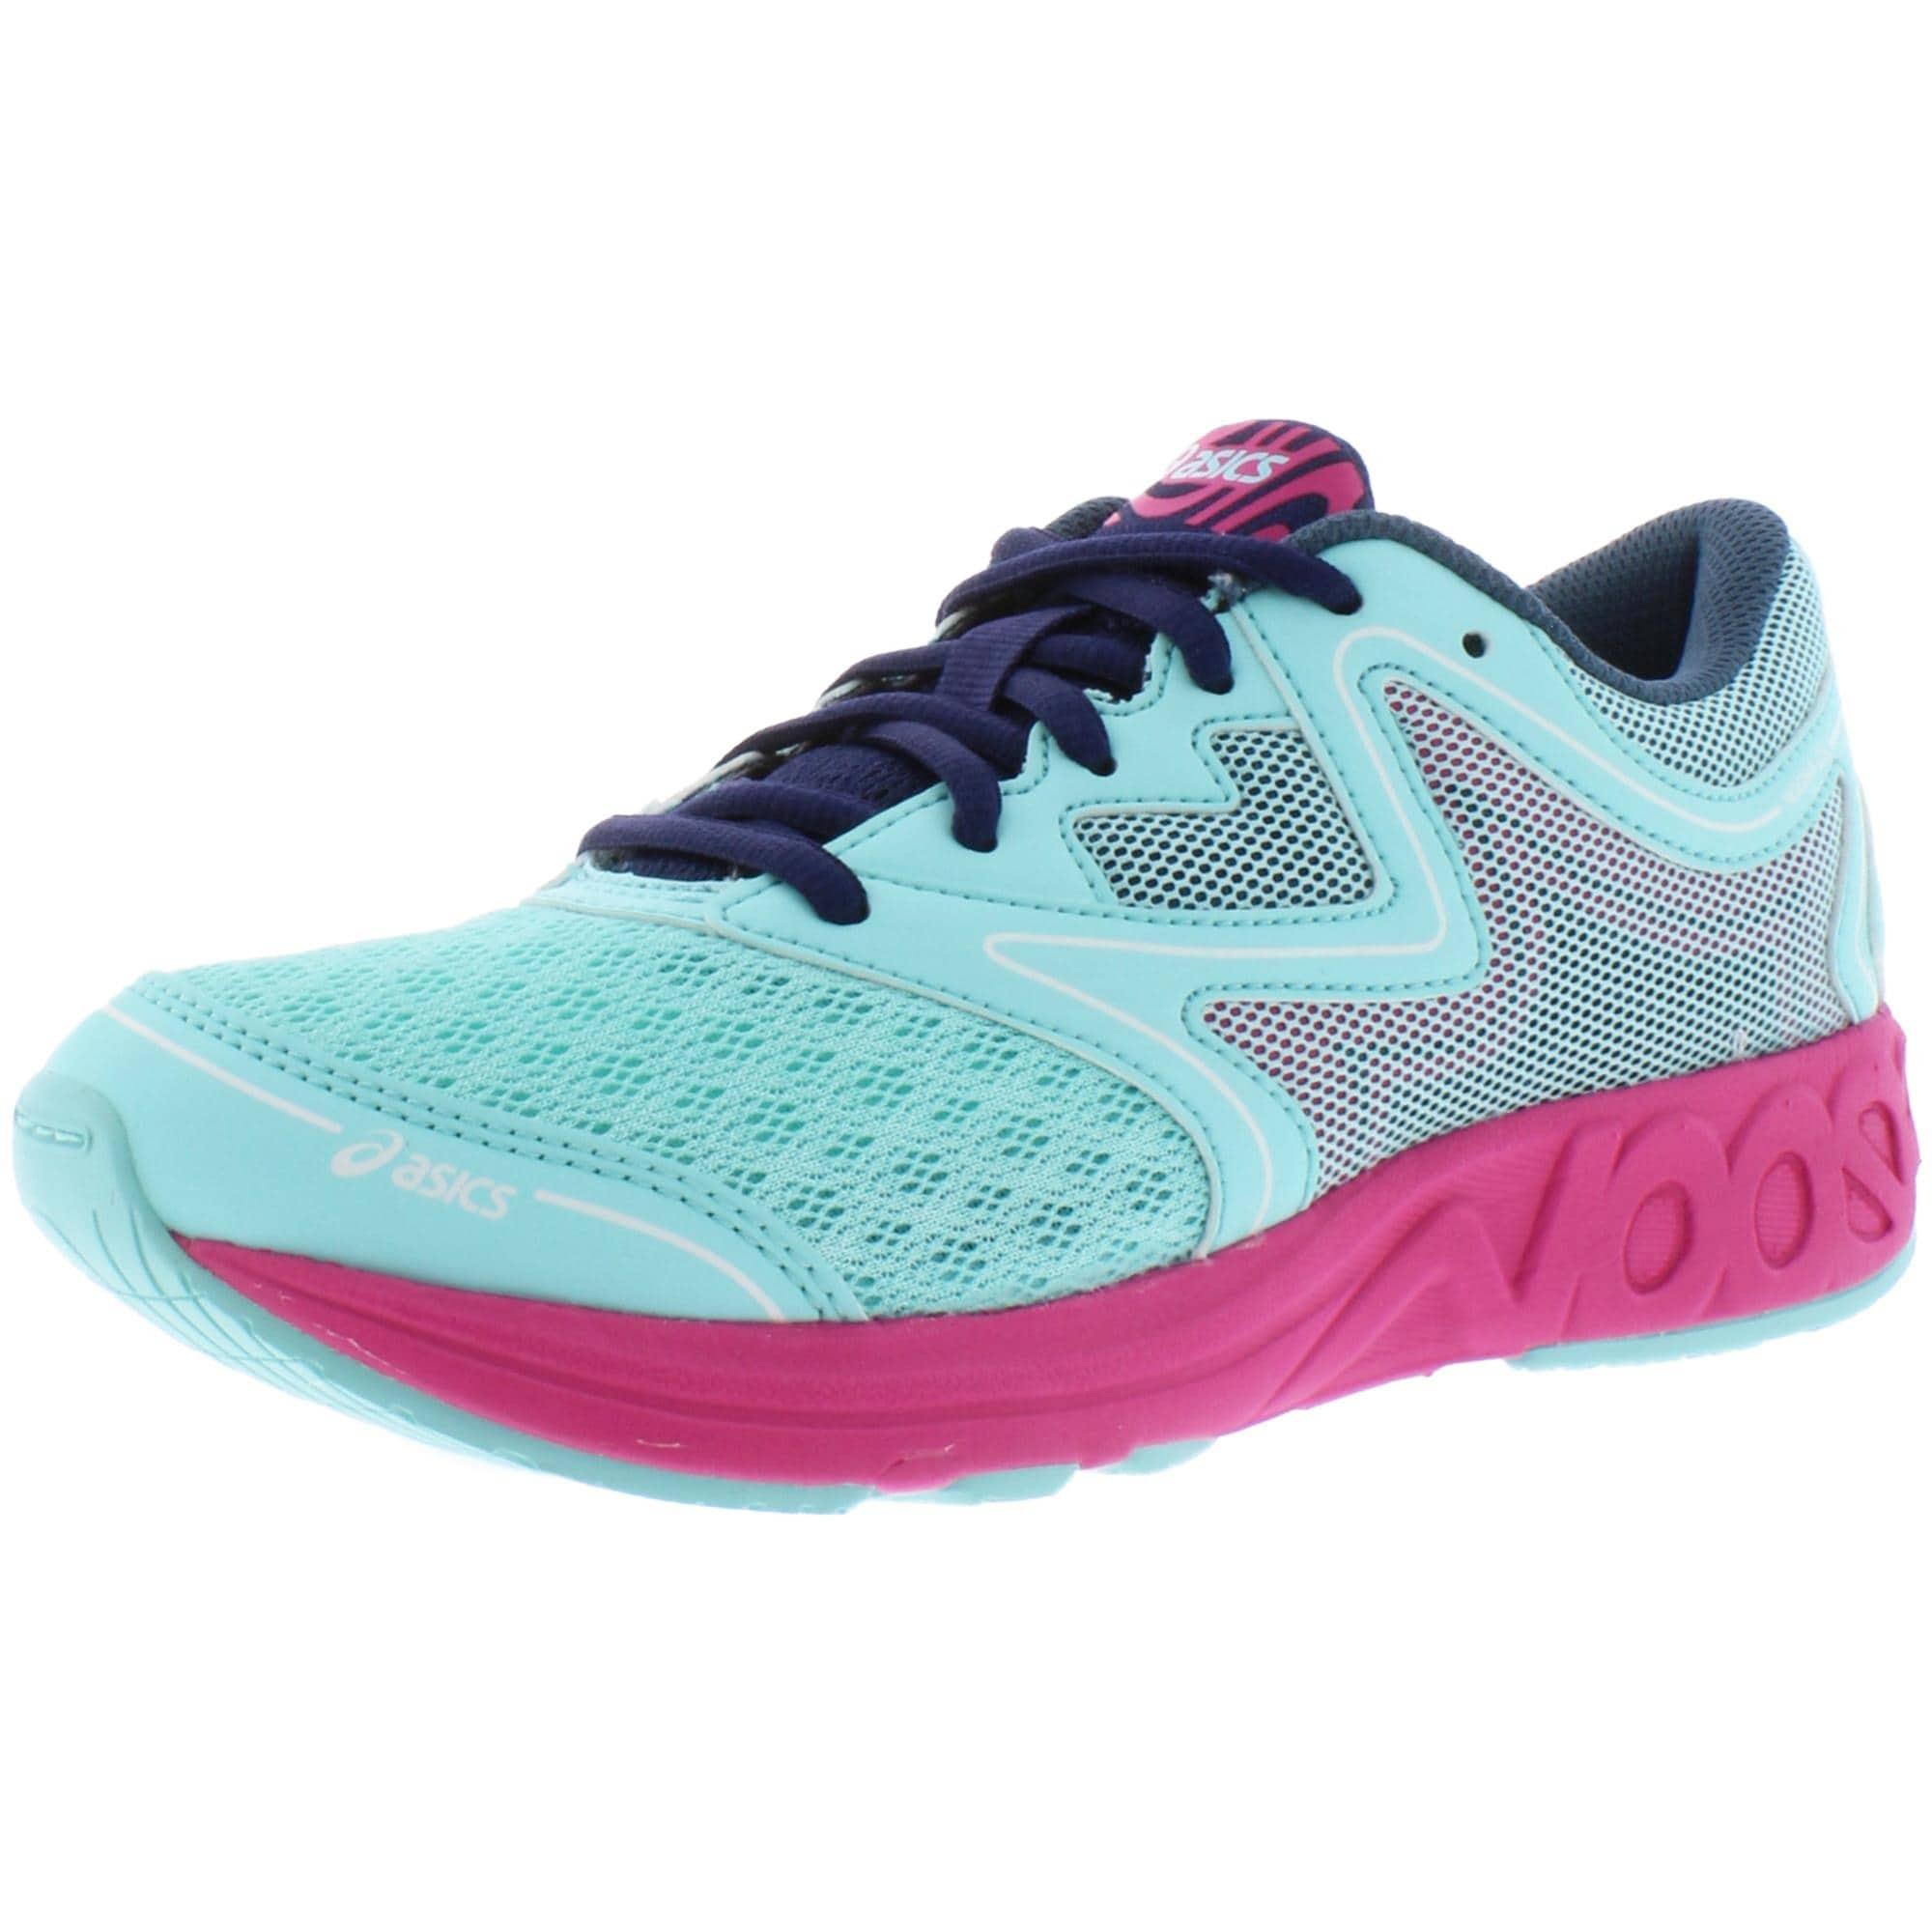 Asics Girls Noosa GS Running Shoes Lifestyle Sport